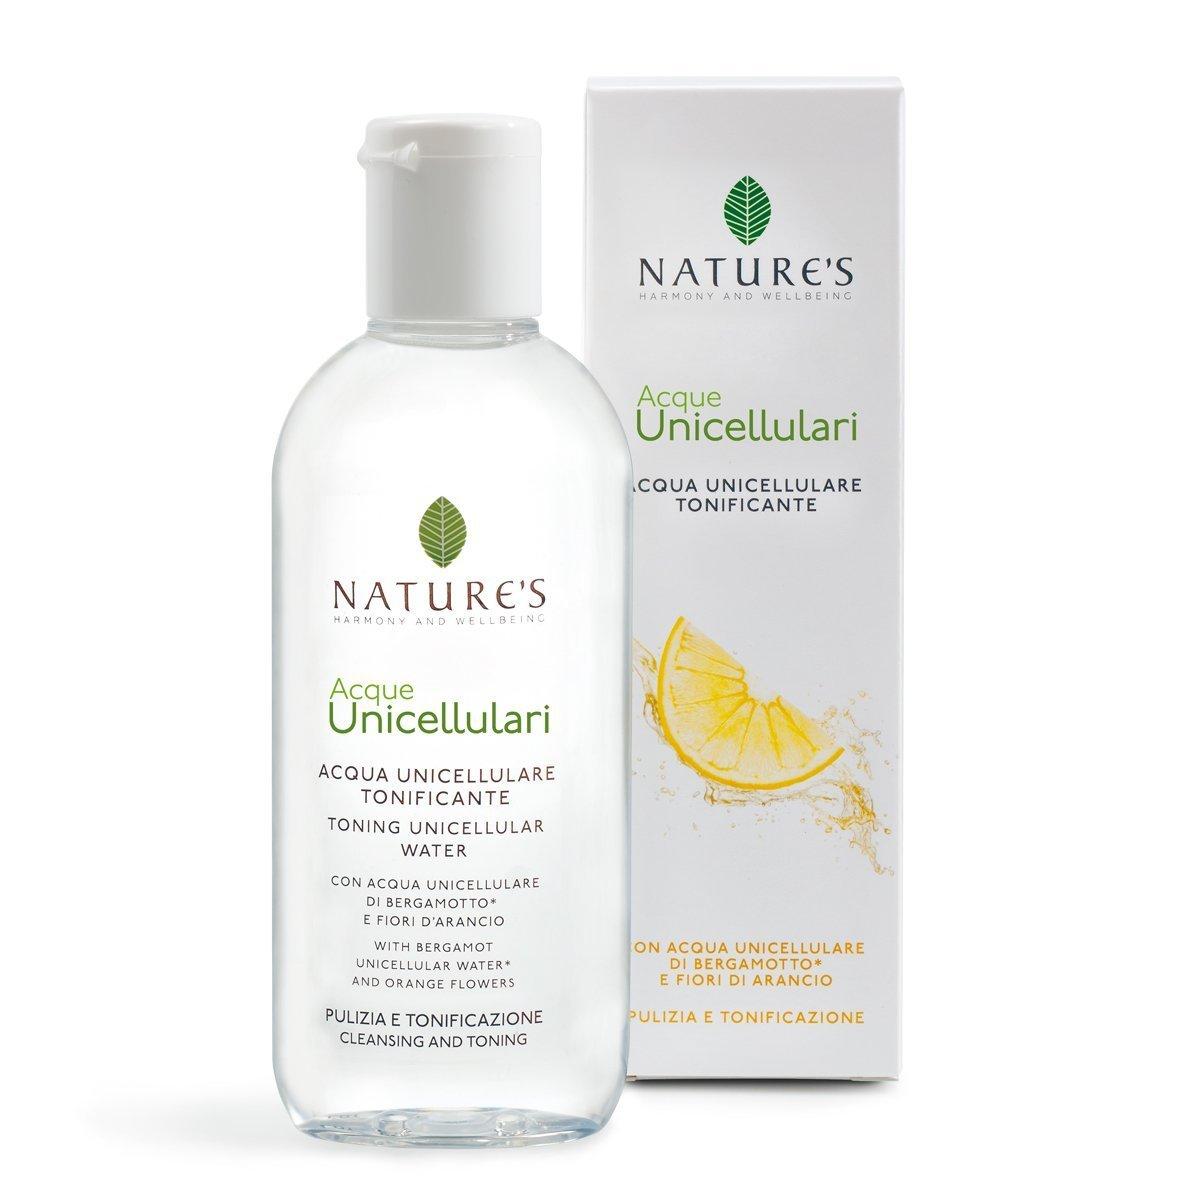 Acqua Unicellulare Tonificante Acque Unicellulari 200 ml